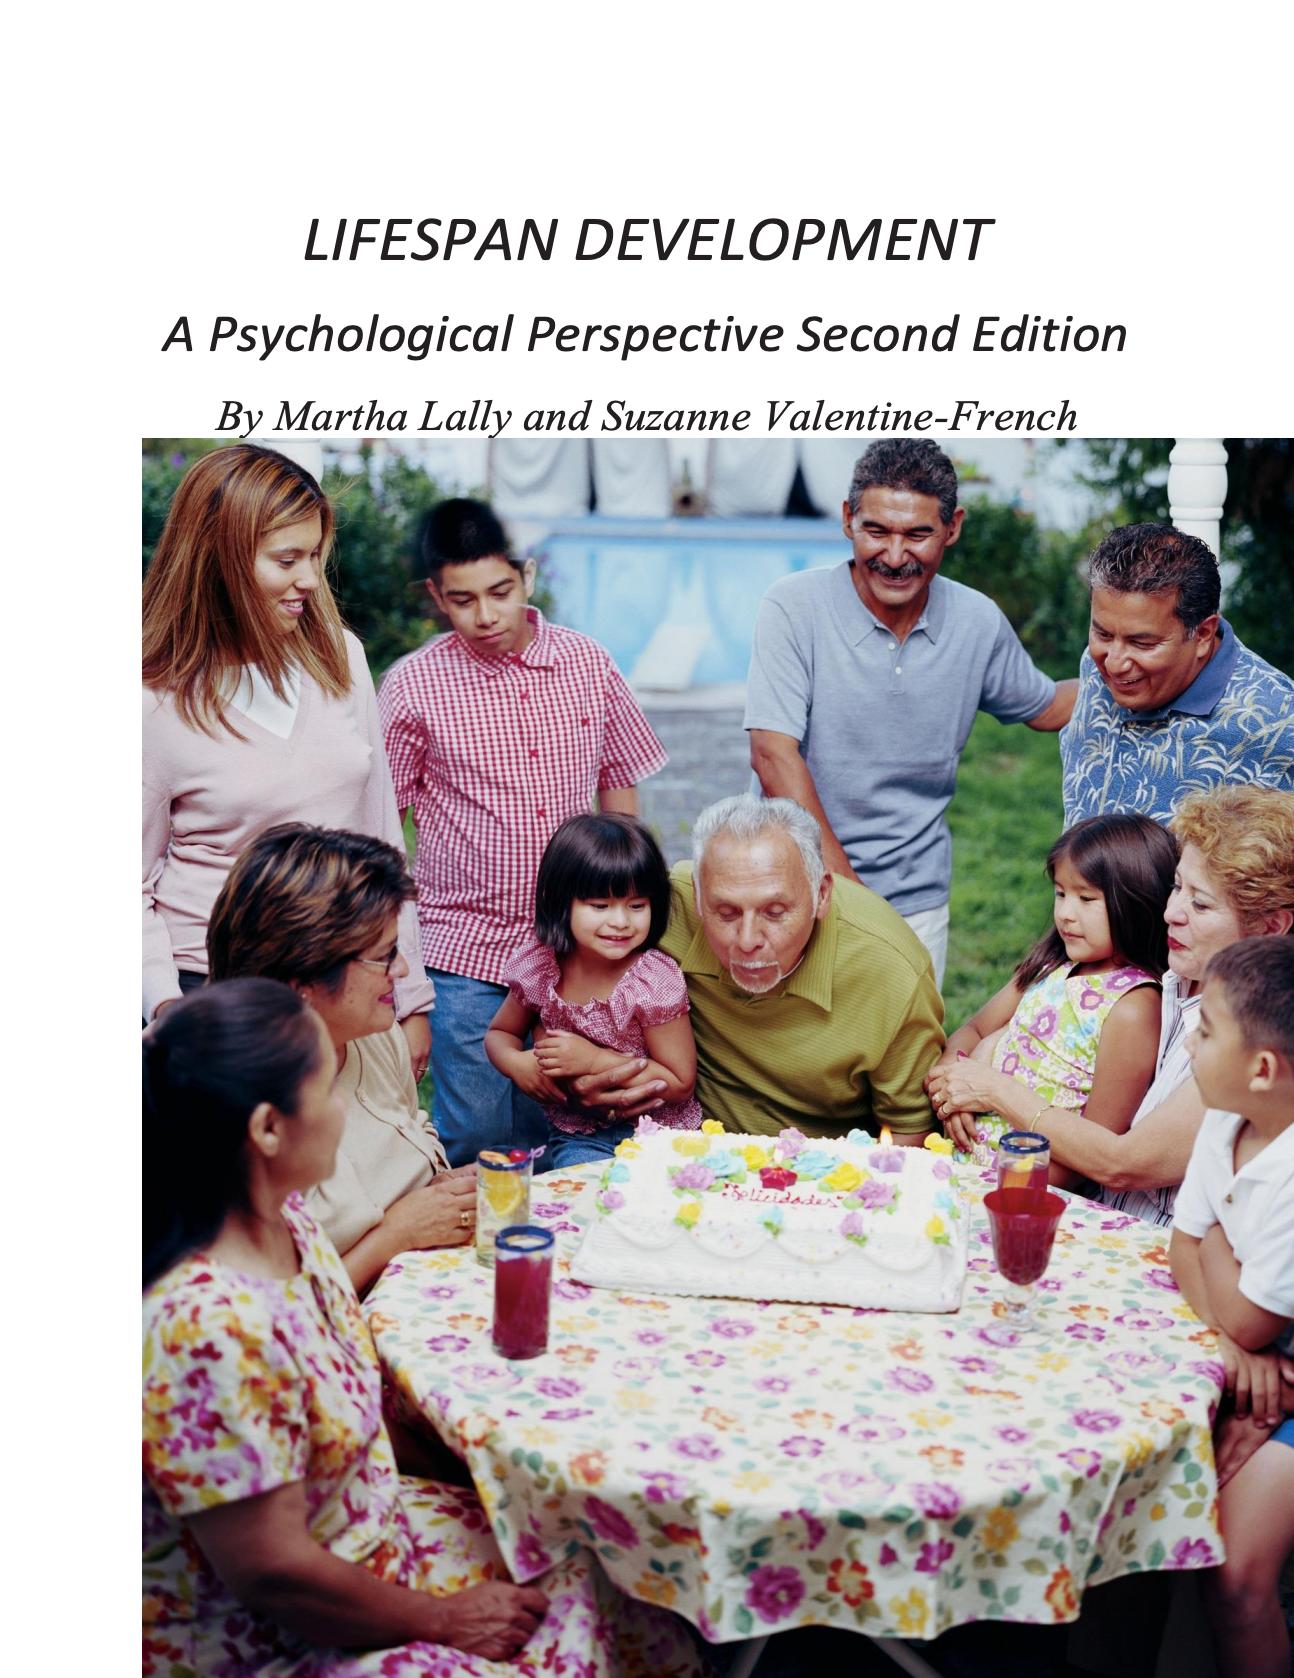 CD 120 - Adult Development